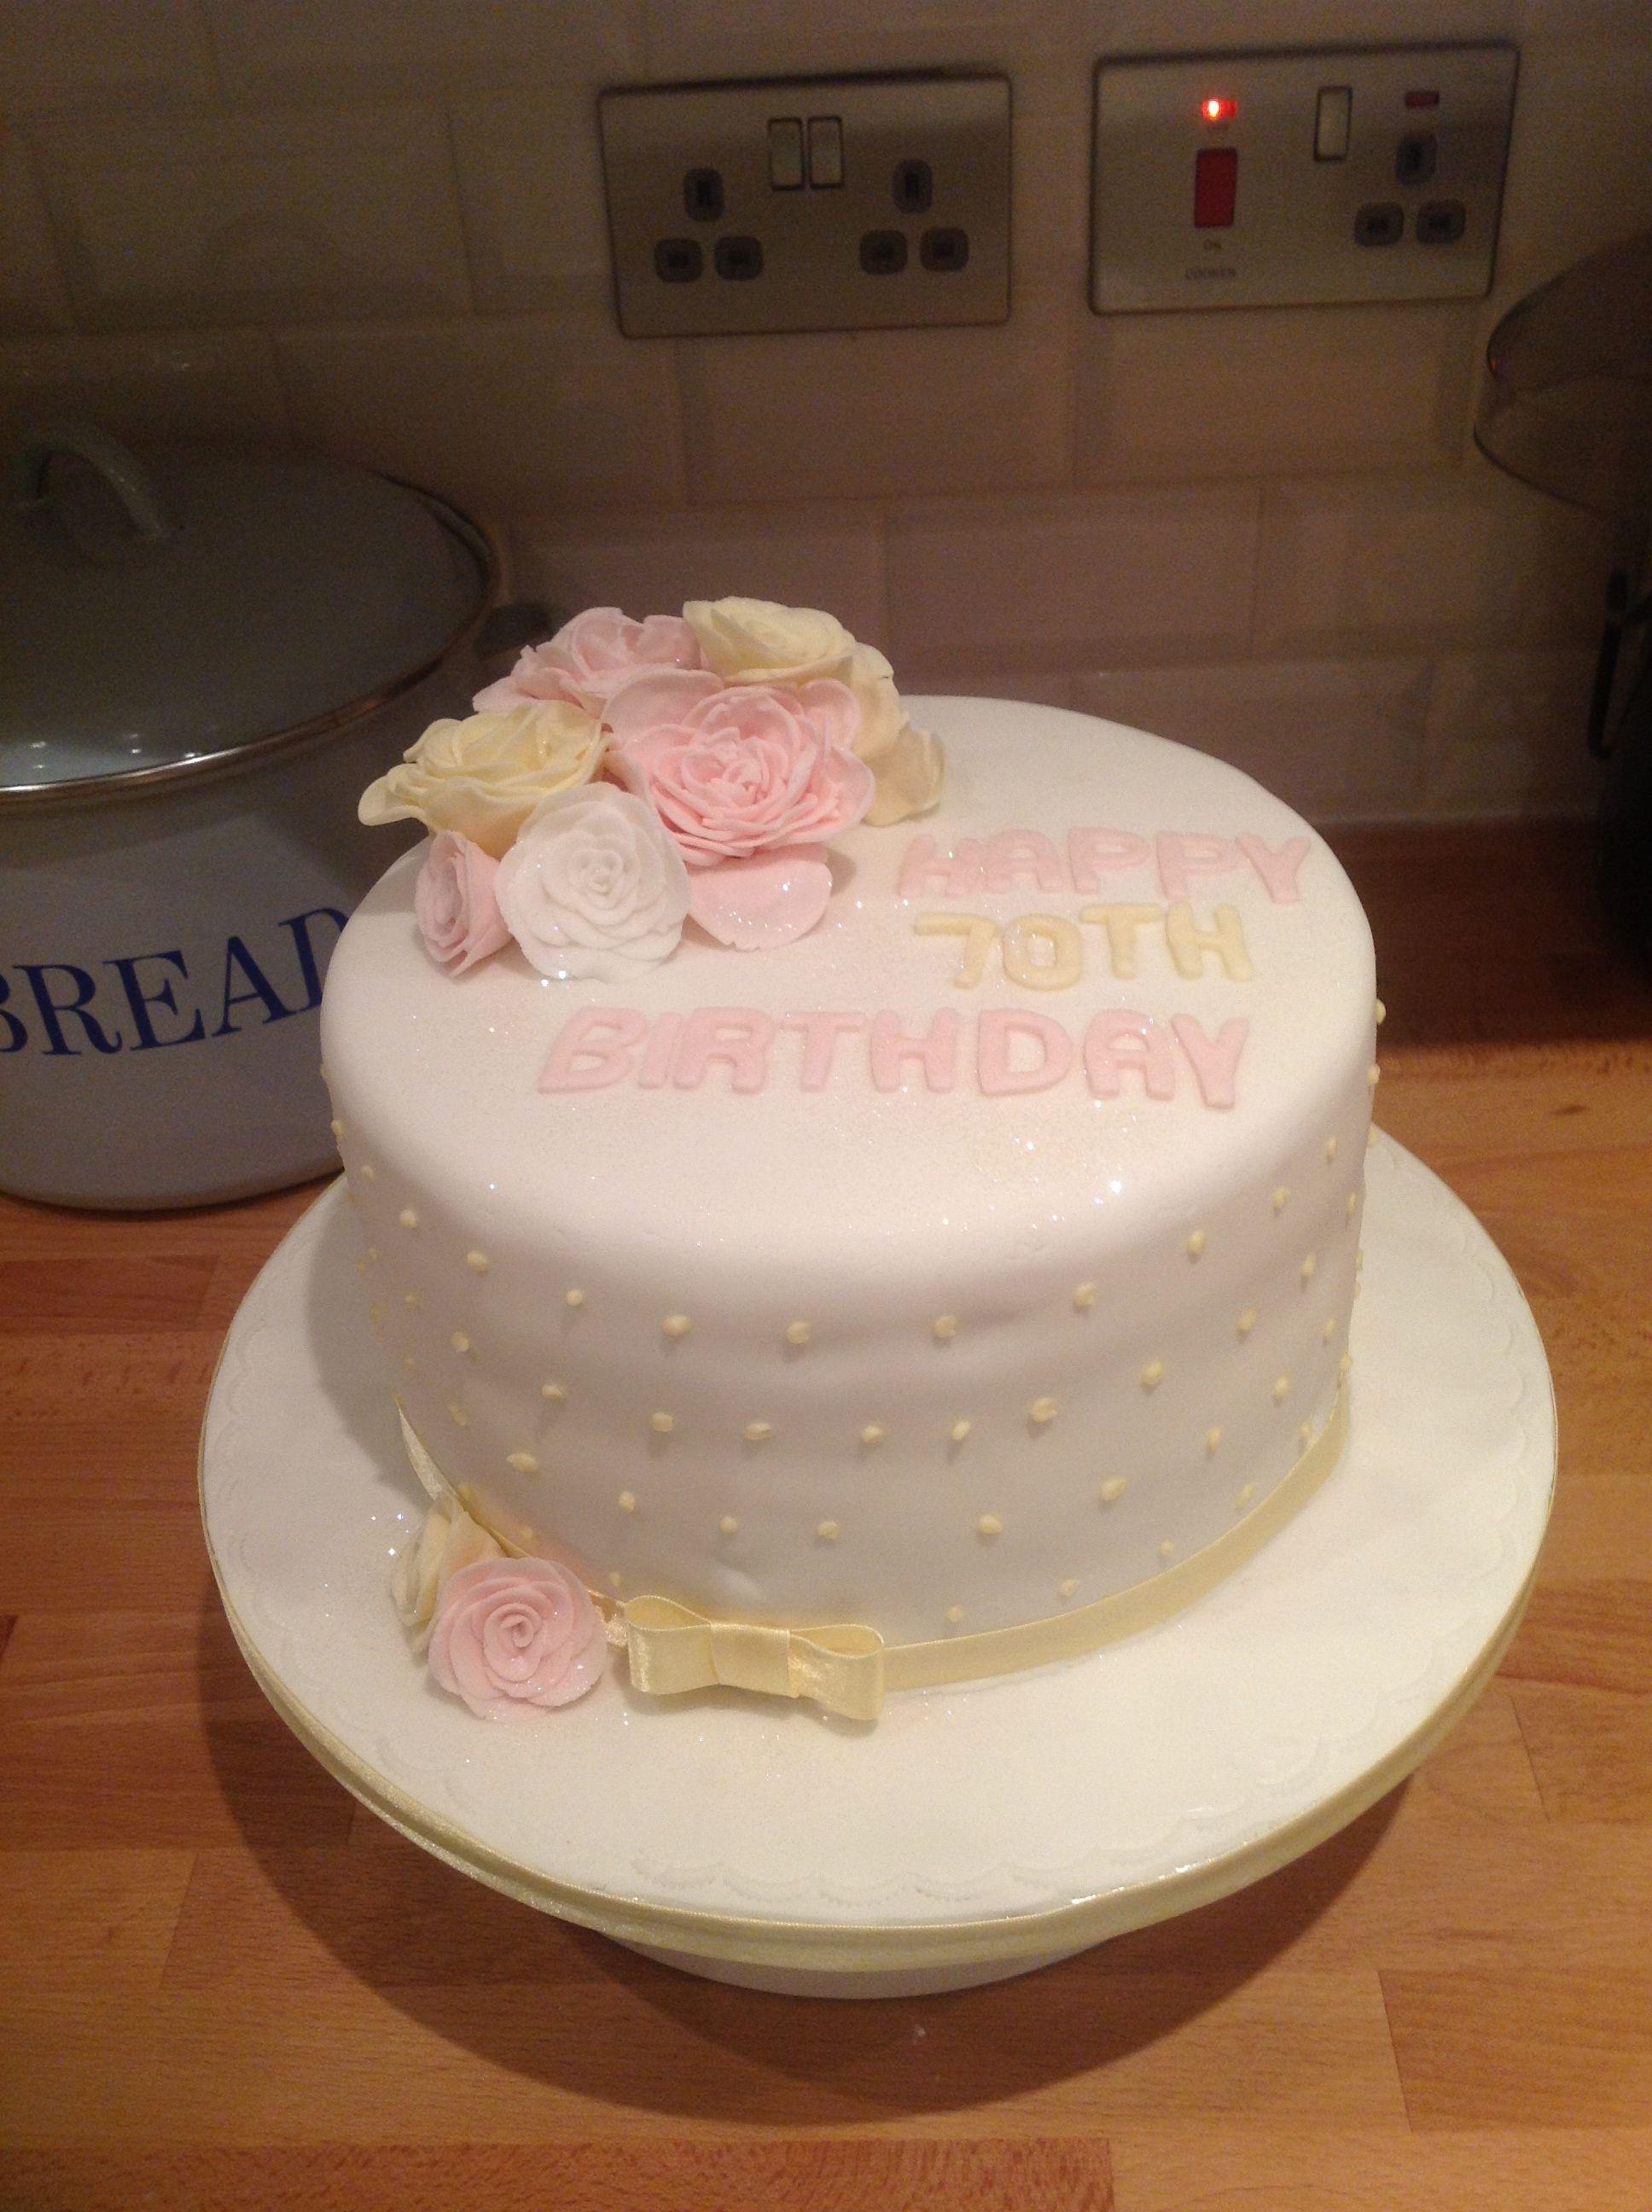 70th Birthday Cake The Bluebell Bakery Recipes Pinterest 70th